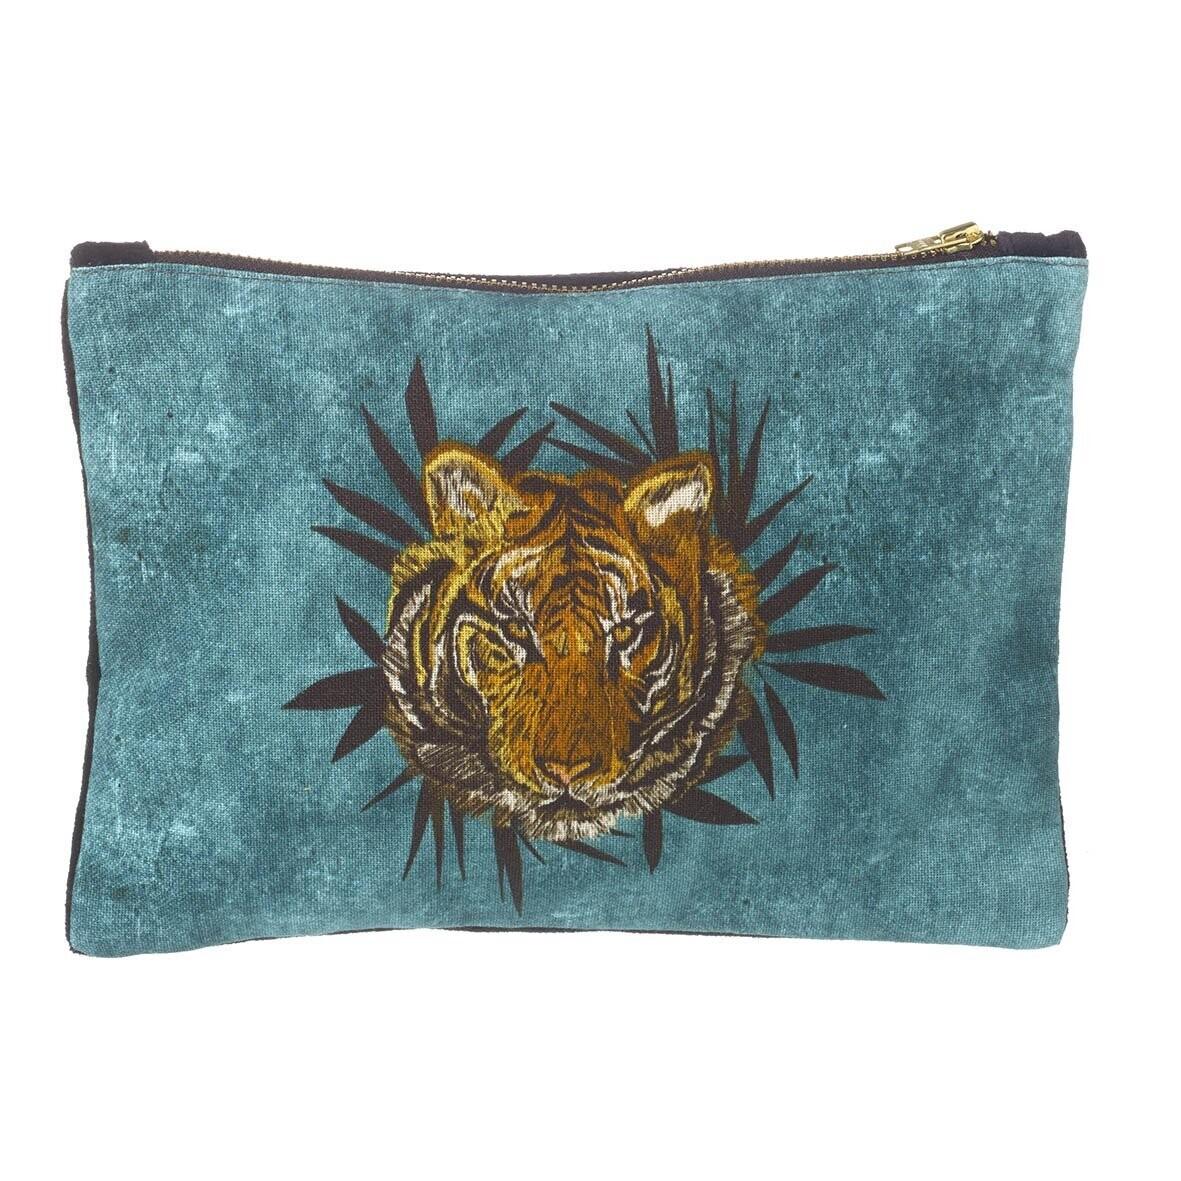 Tiger Face Cotton Bag - Teal